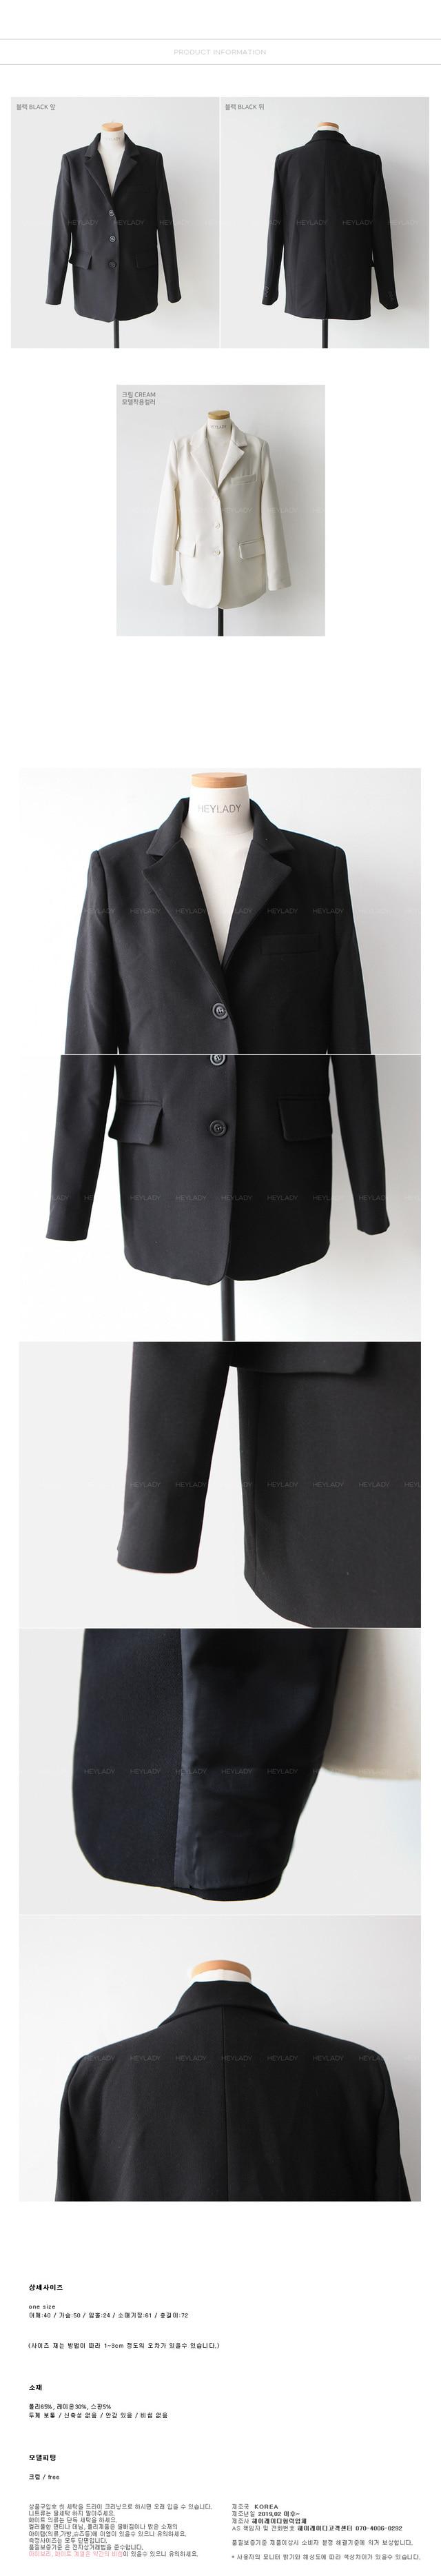 Project Single Jacket